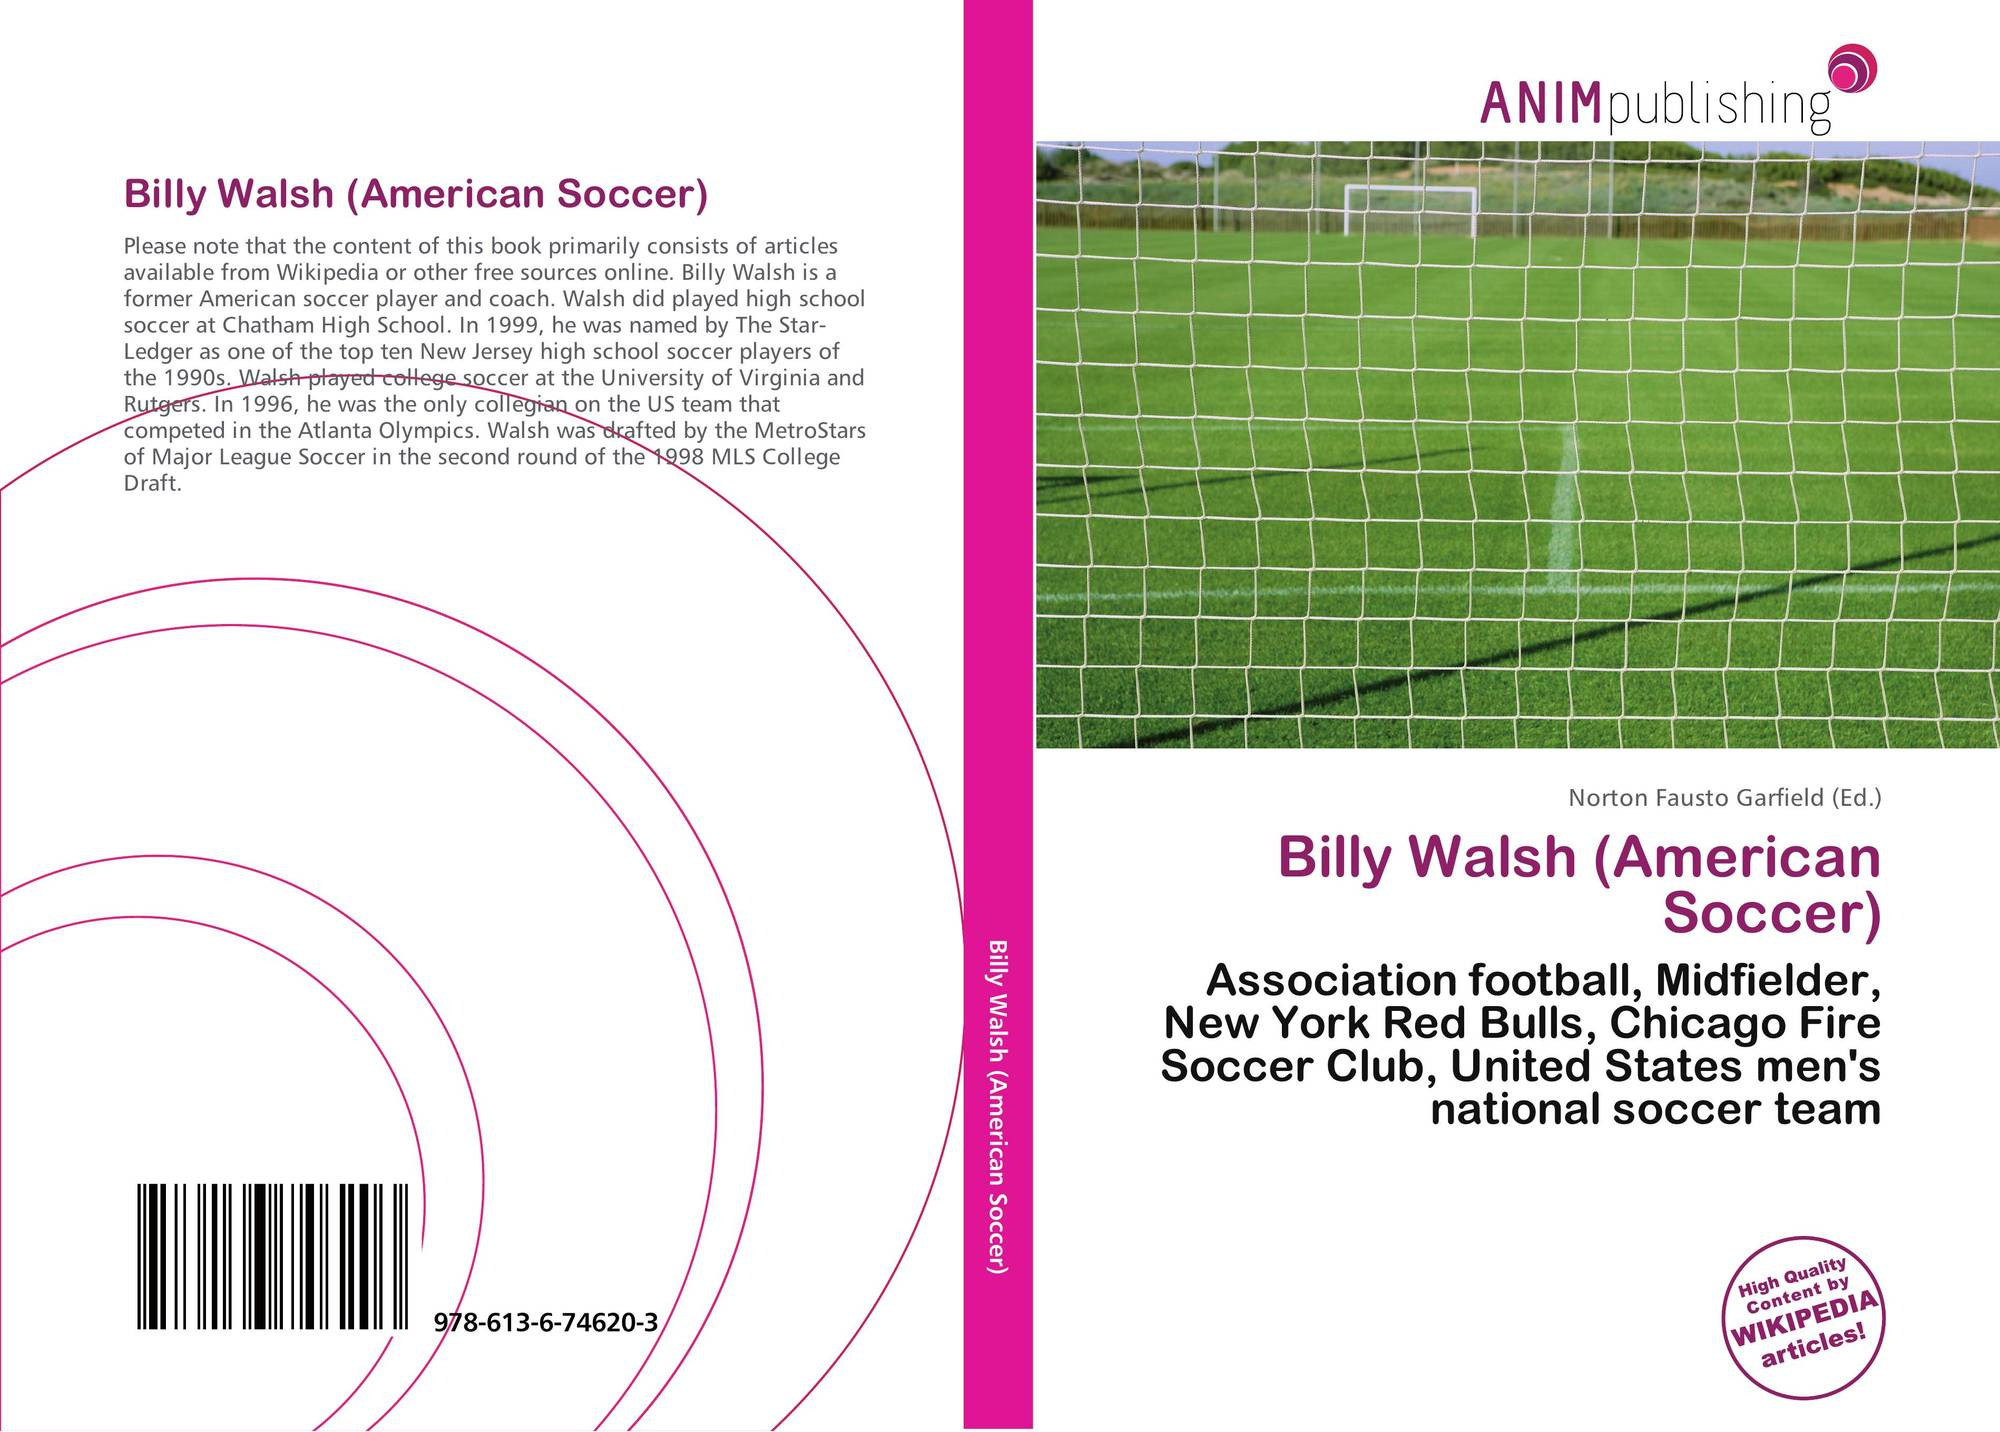 a25c5227c1e Billy Walsh (American Soccer)